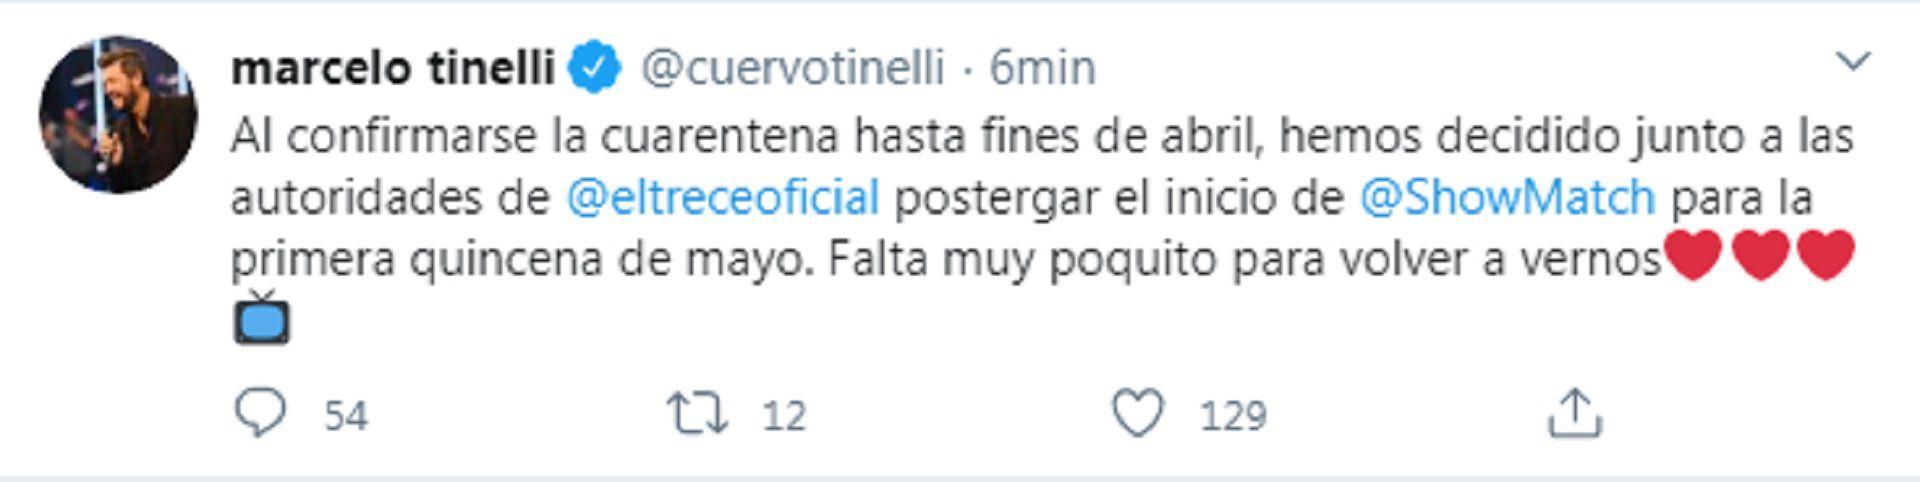 El tuit de Marcelo Tinelli